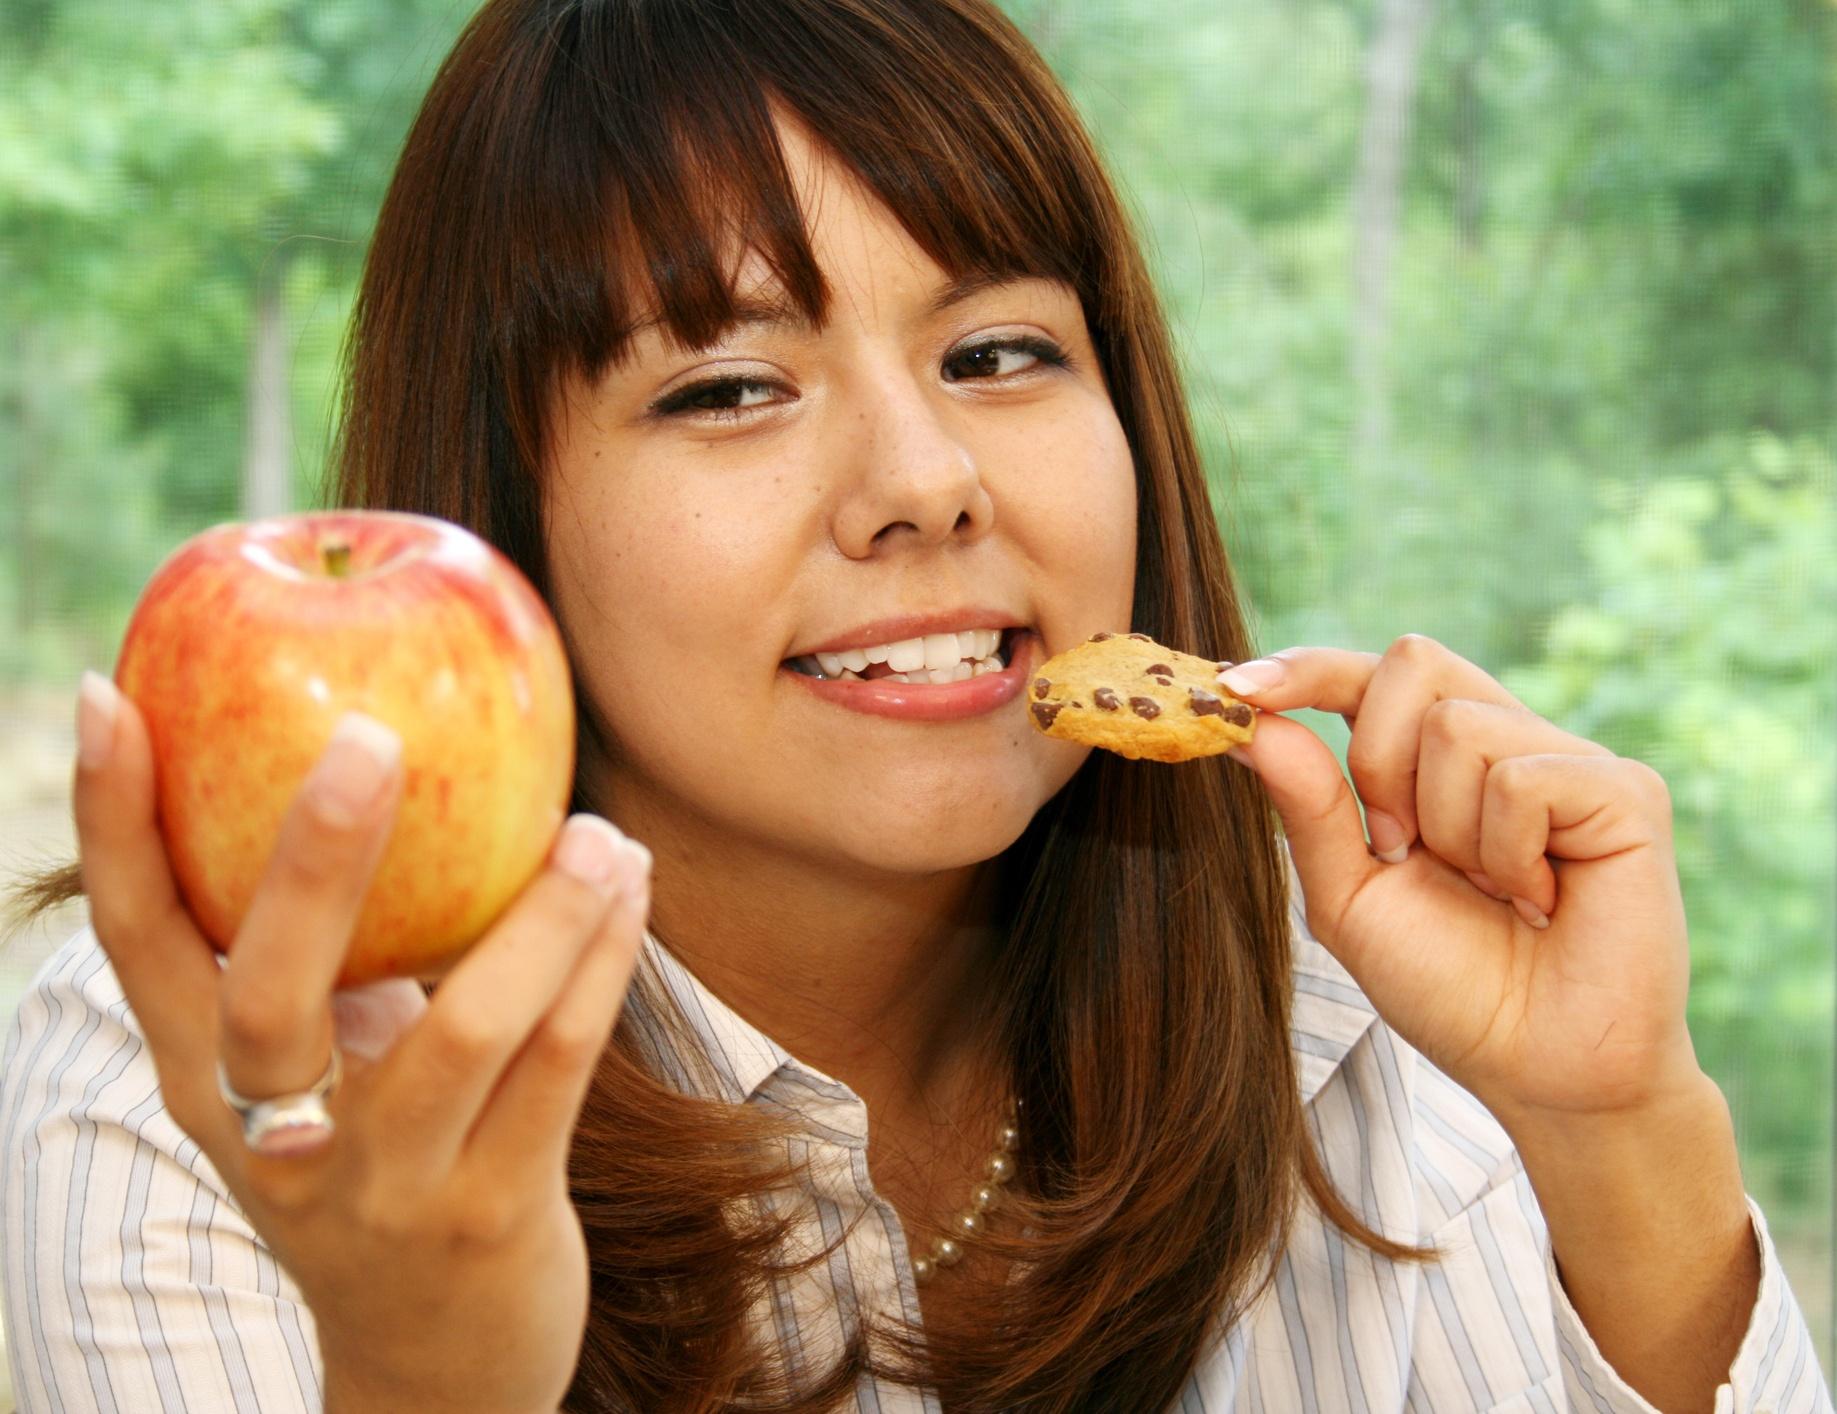 Young-Hispanic-Woman-Making-A-Food-Choice-CROPPED.jpg